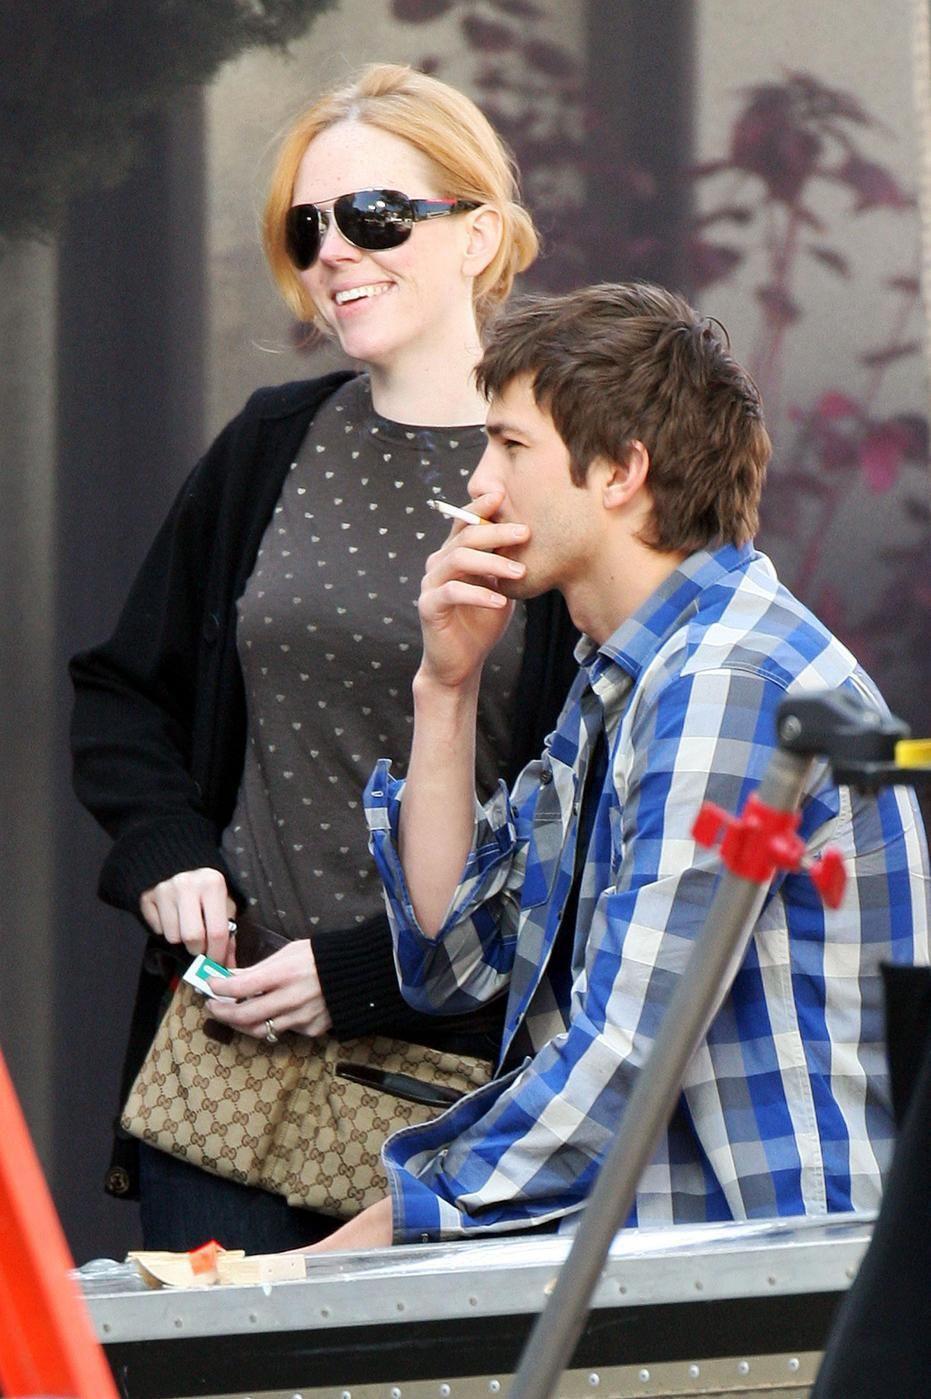 Ashton Kutcher smoking a cigarette (or weed)